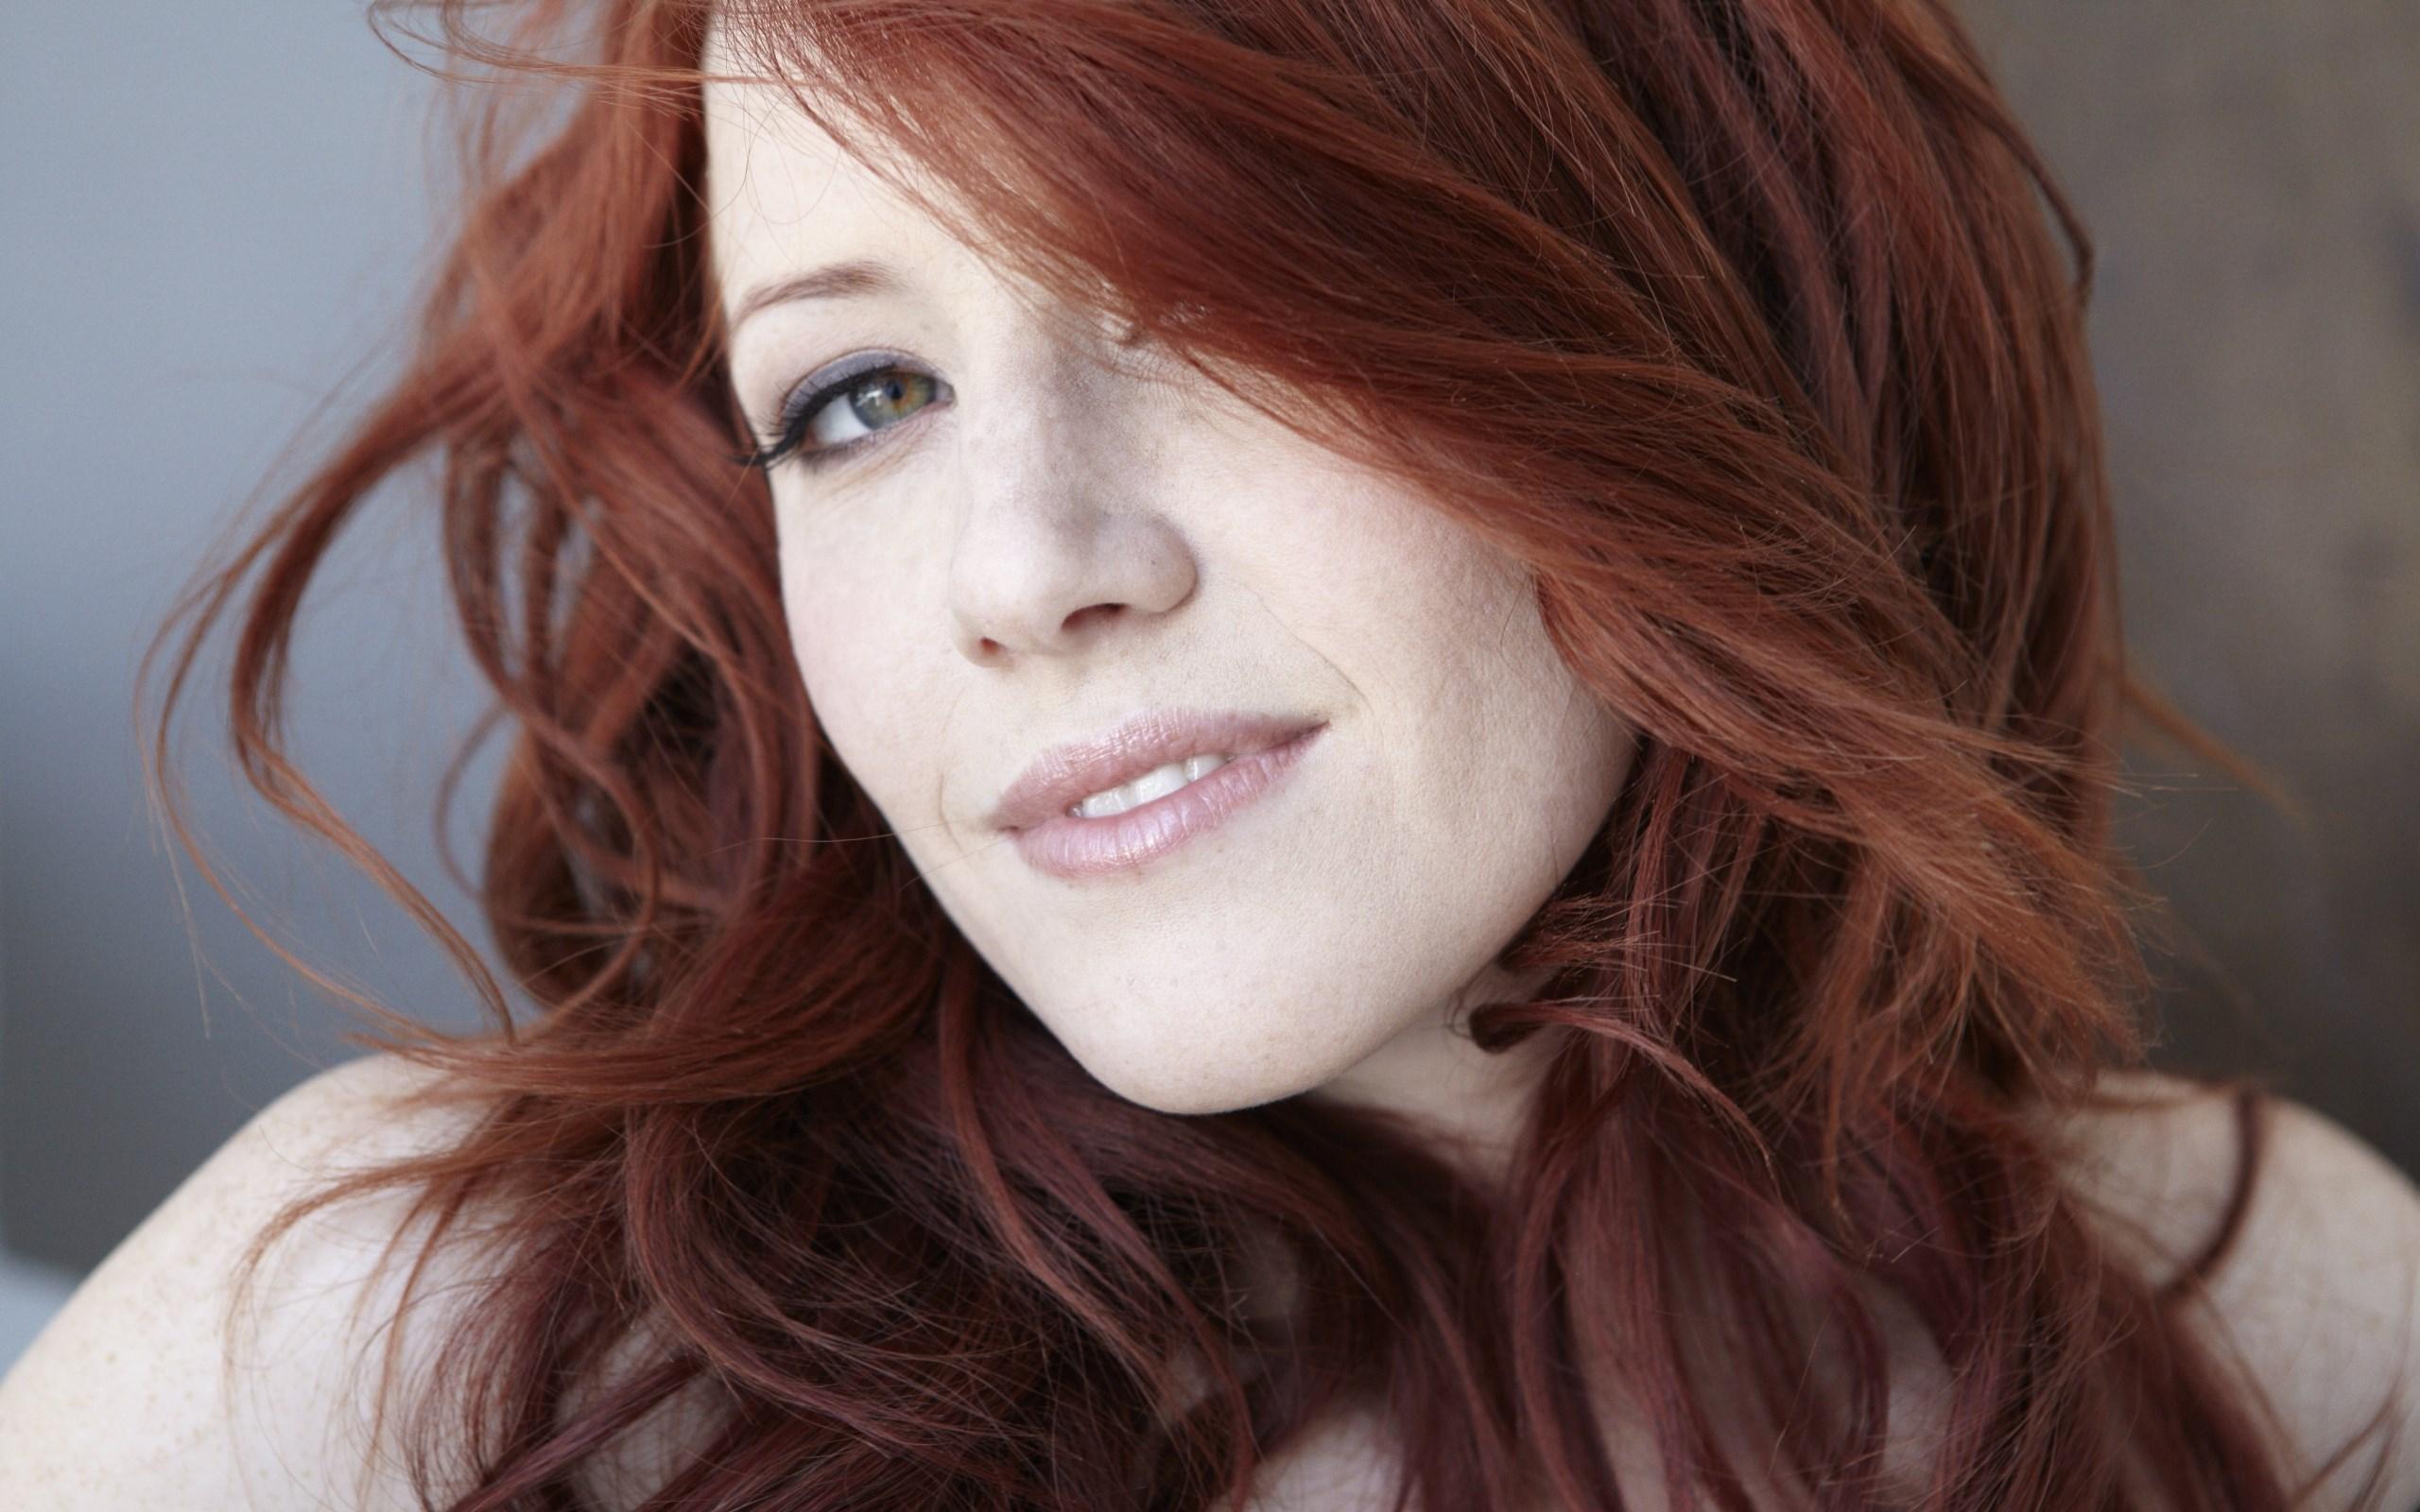 Portrait Redhead Girl Smile